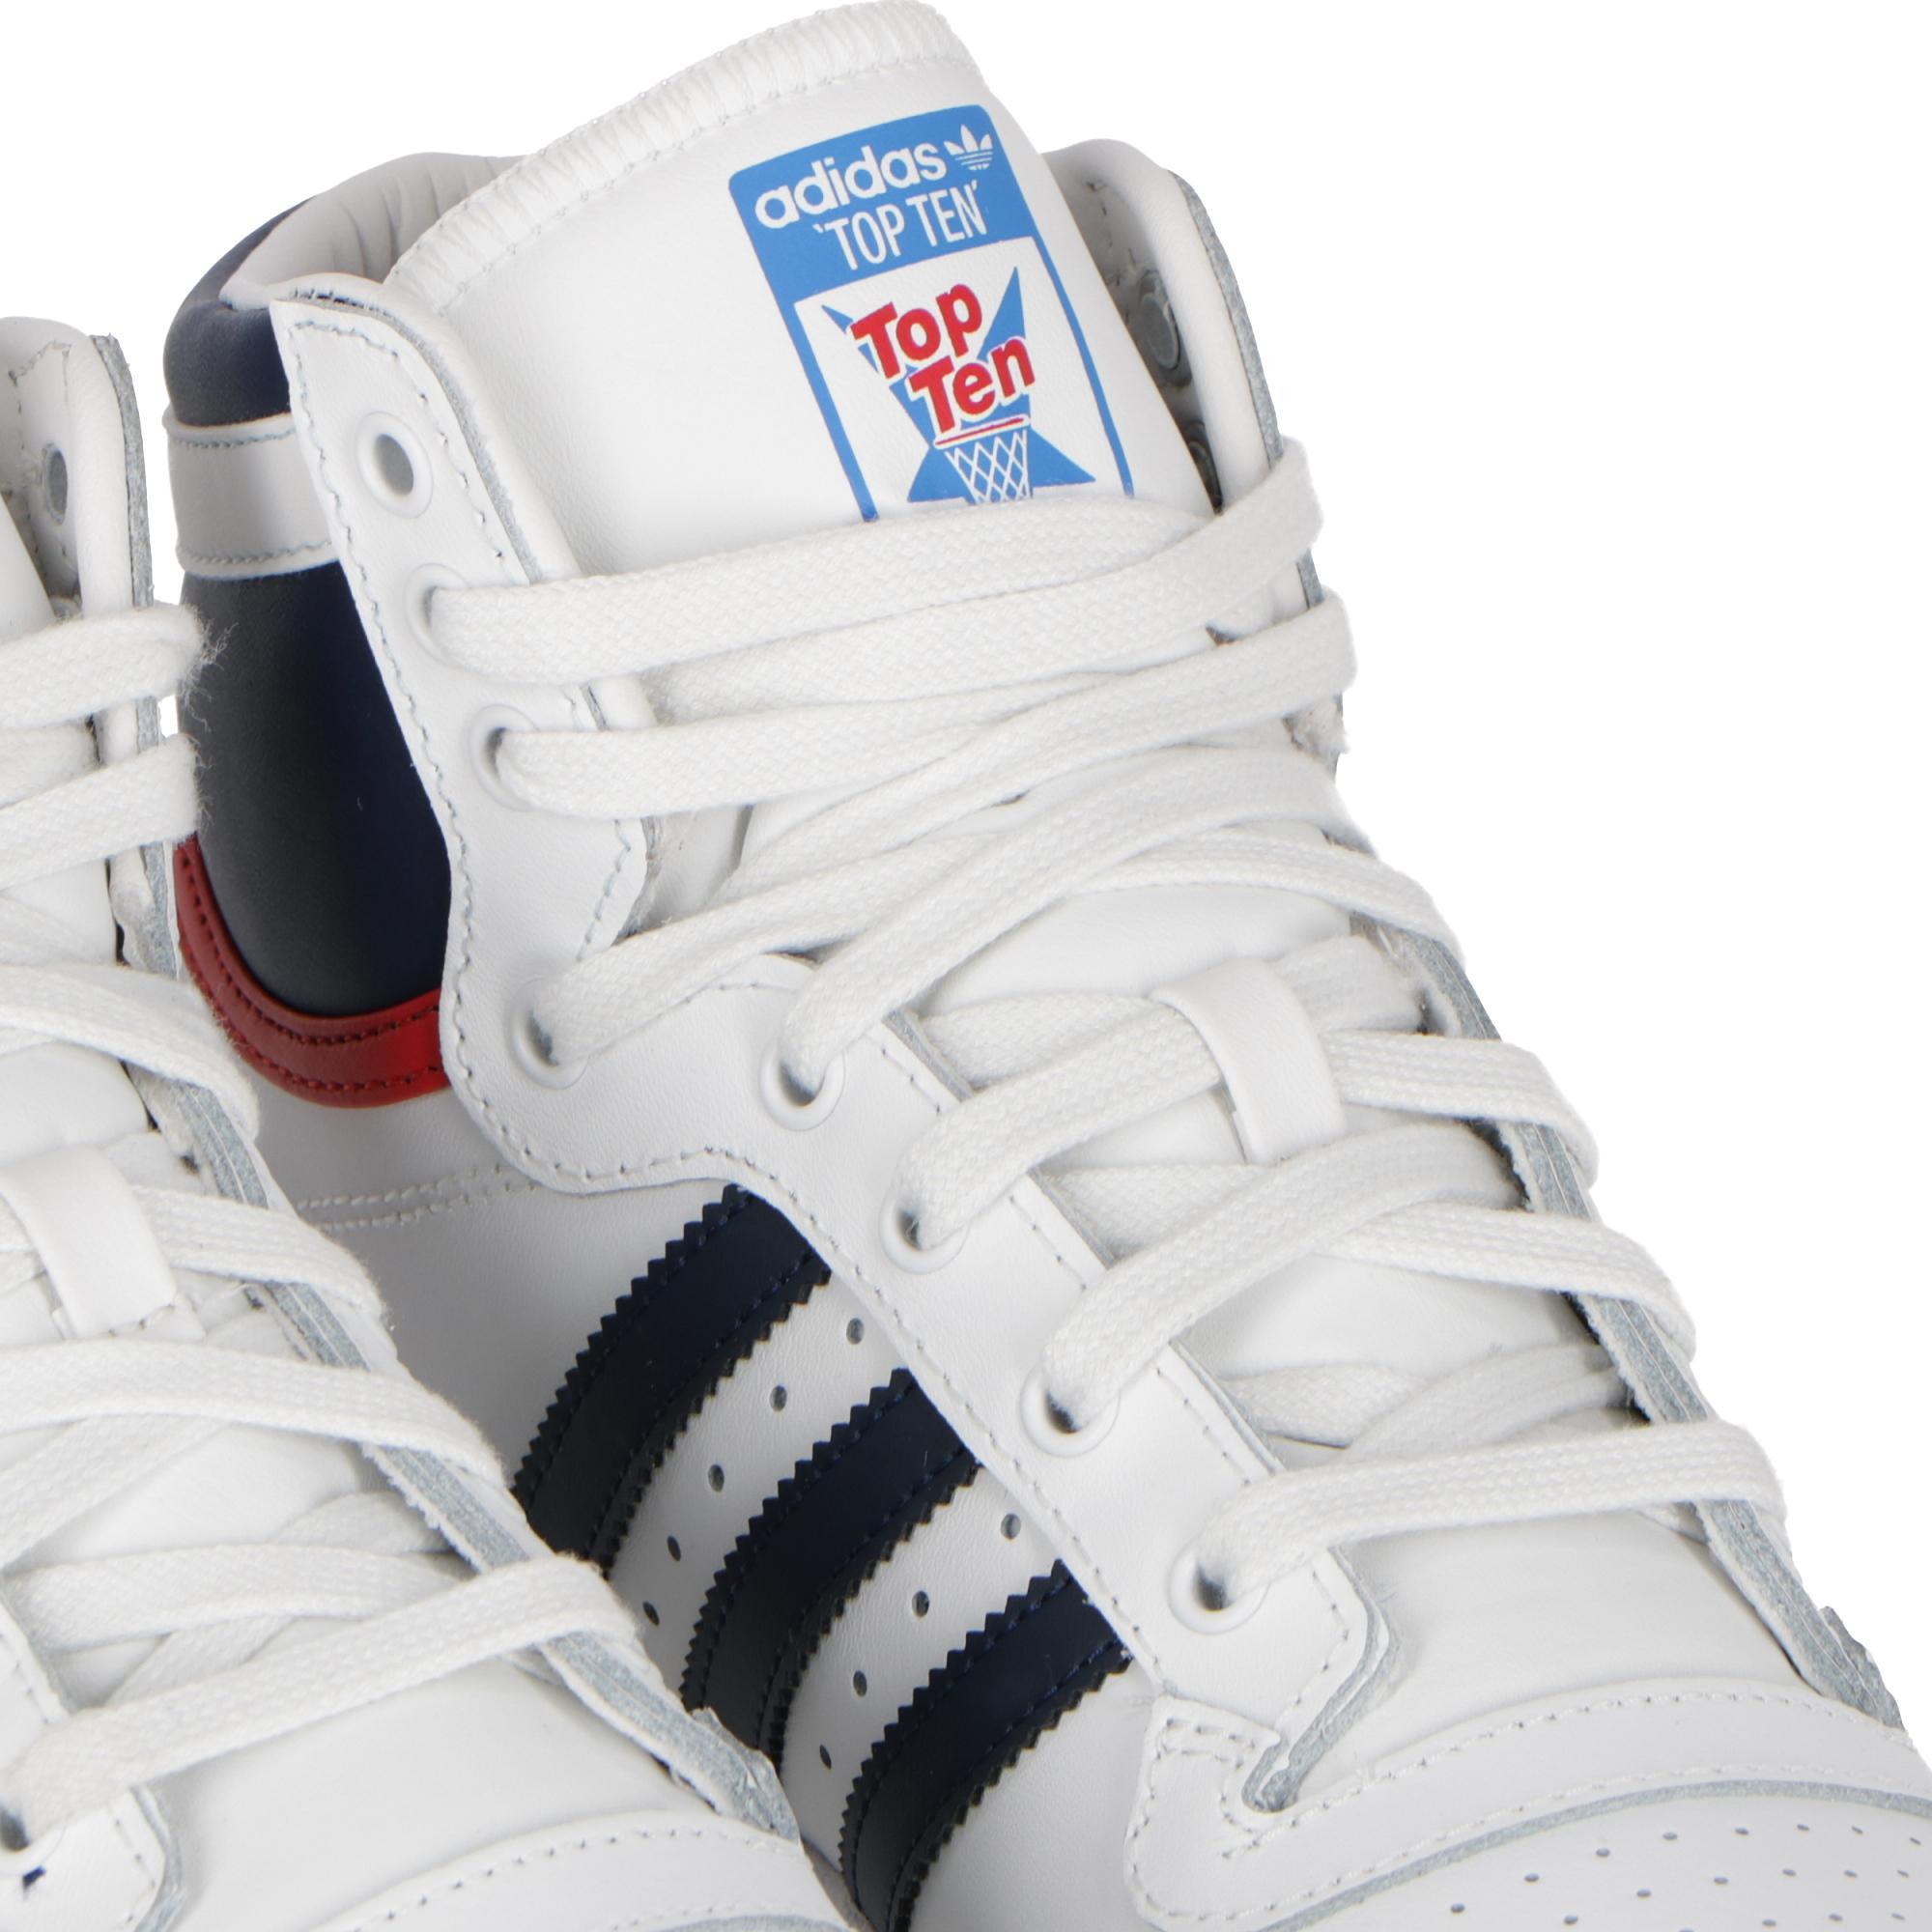 finest selection 45db4 dc05c Adidas Top Ten Hi - Kids White navy collegiate red